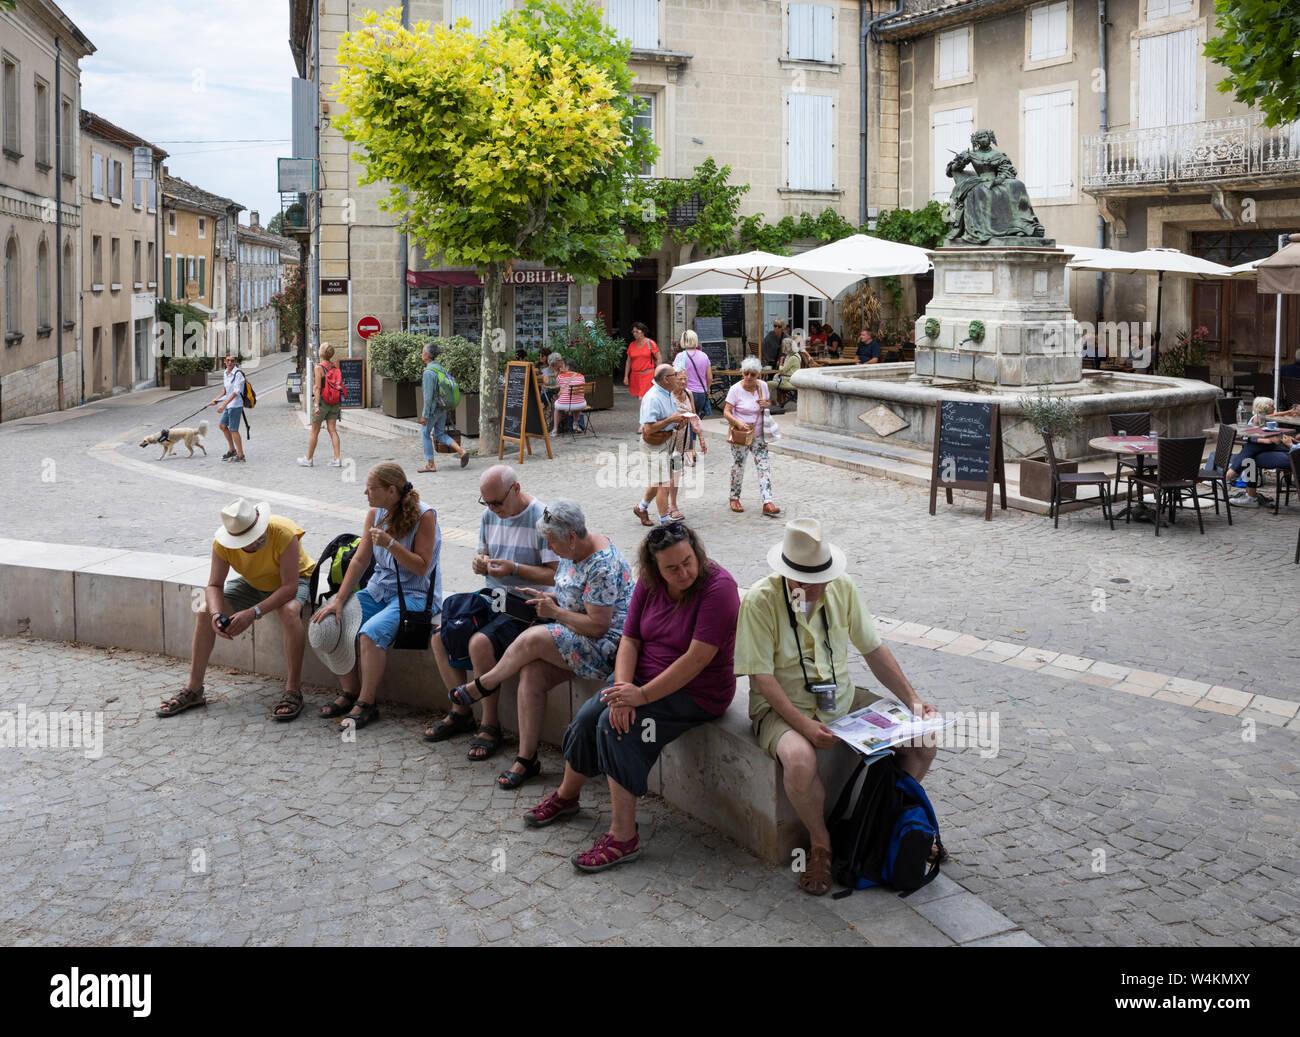 Tourists resting in the Place Sévigné, Grignan, Drome department, Auvergne-Rhone-Alpes, Provence, France, Europe Stock Photo